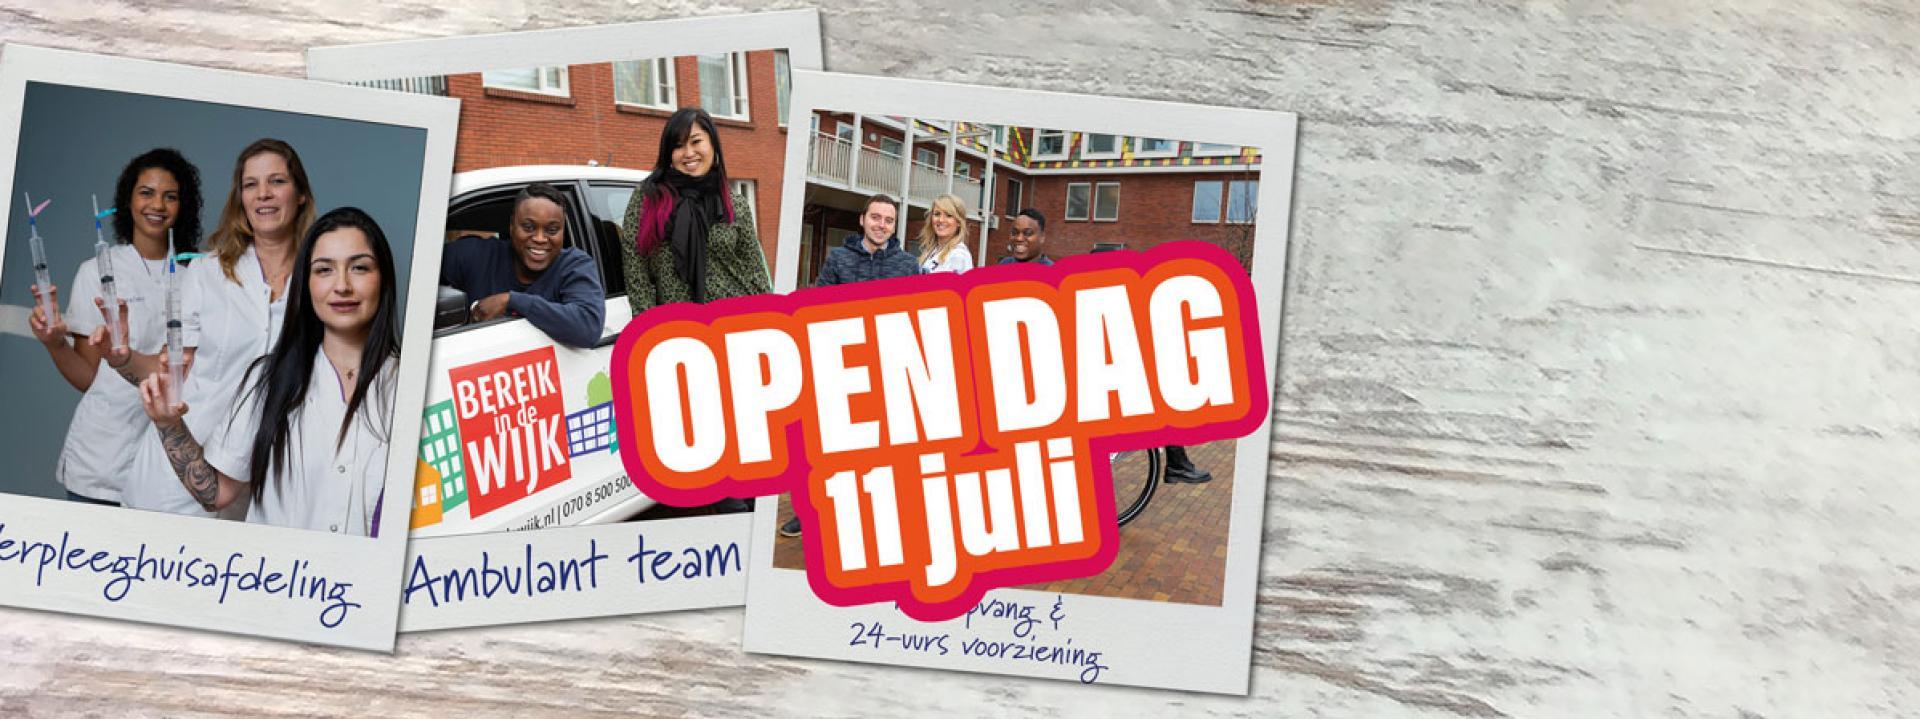 open-dag-11-juli-2020